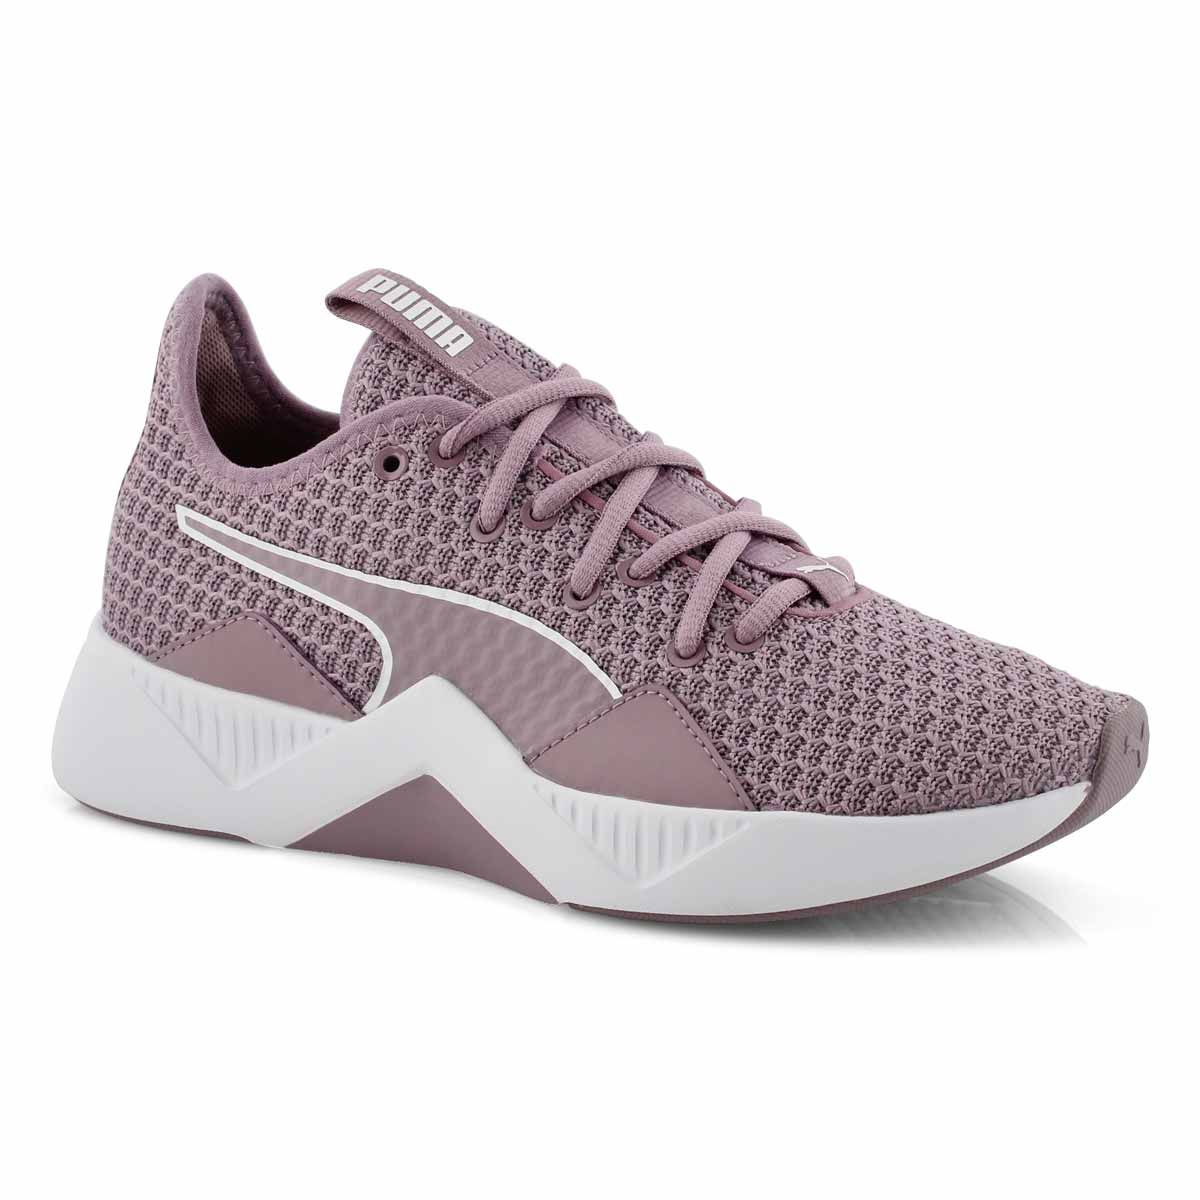 Lds Incite FS elderberry lace up sneaker